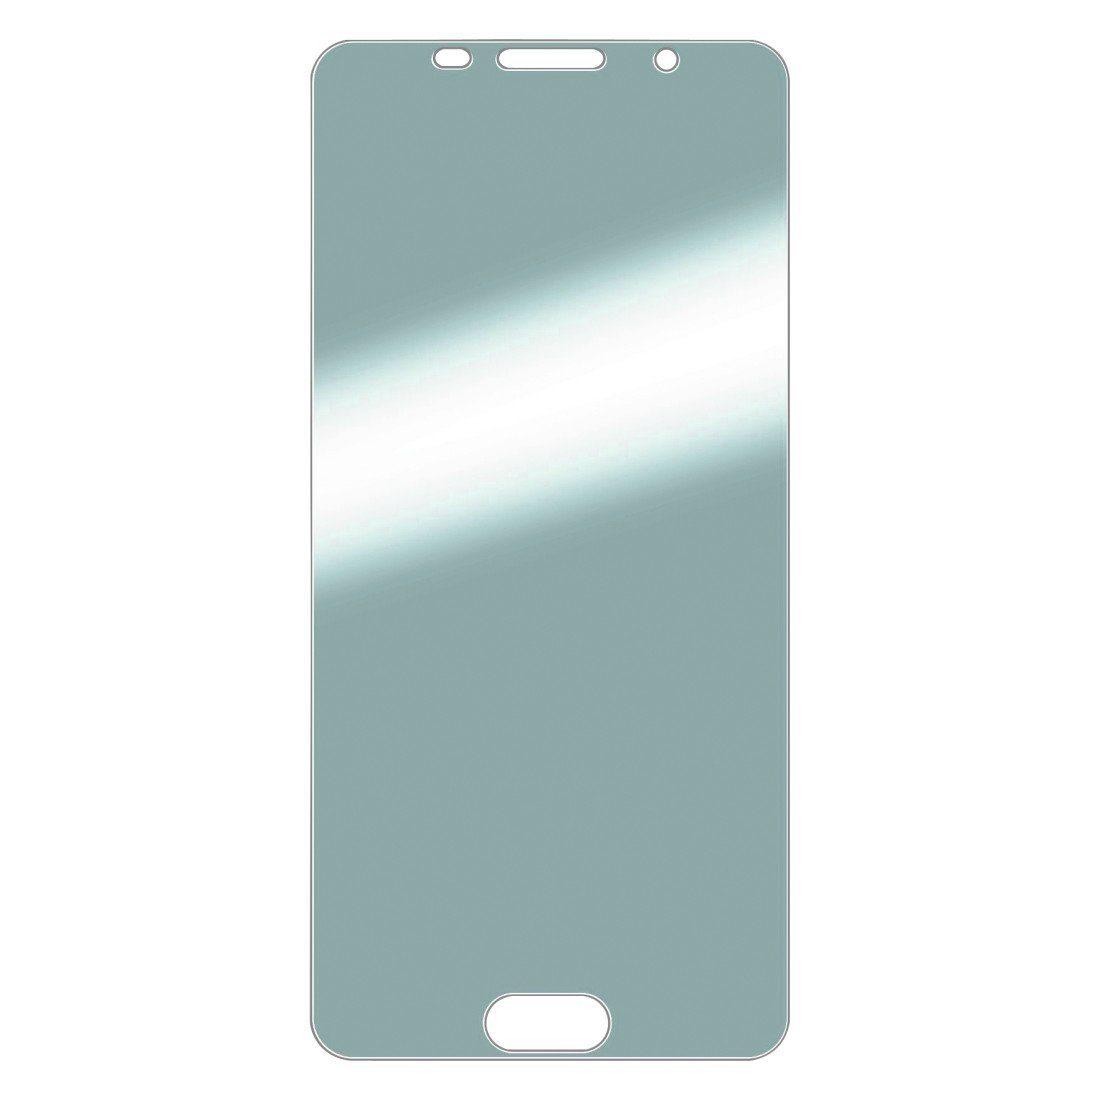 Hama Display-Schutzfolie Crystal Clear für Samsung Galaxy A5 (2016)